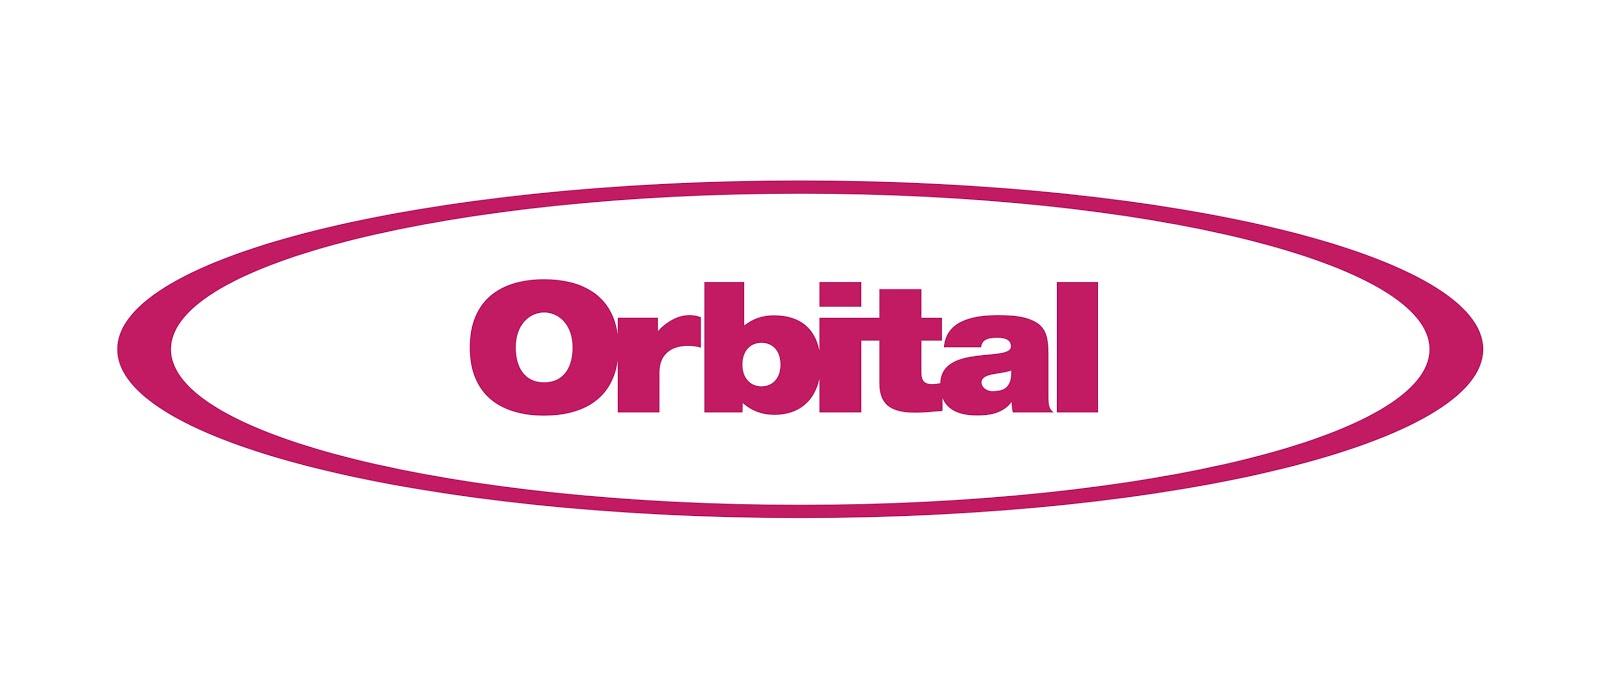 Eorbital Logo photo - 1